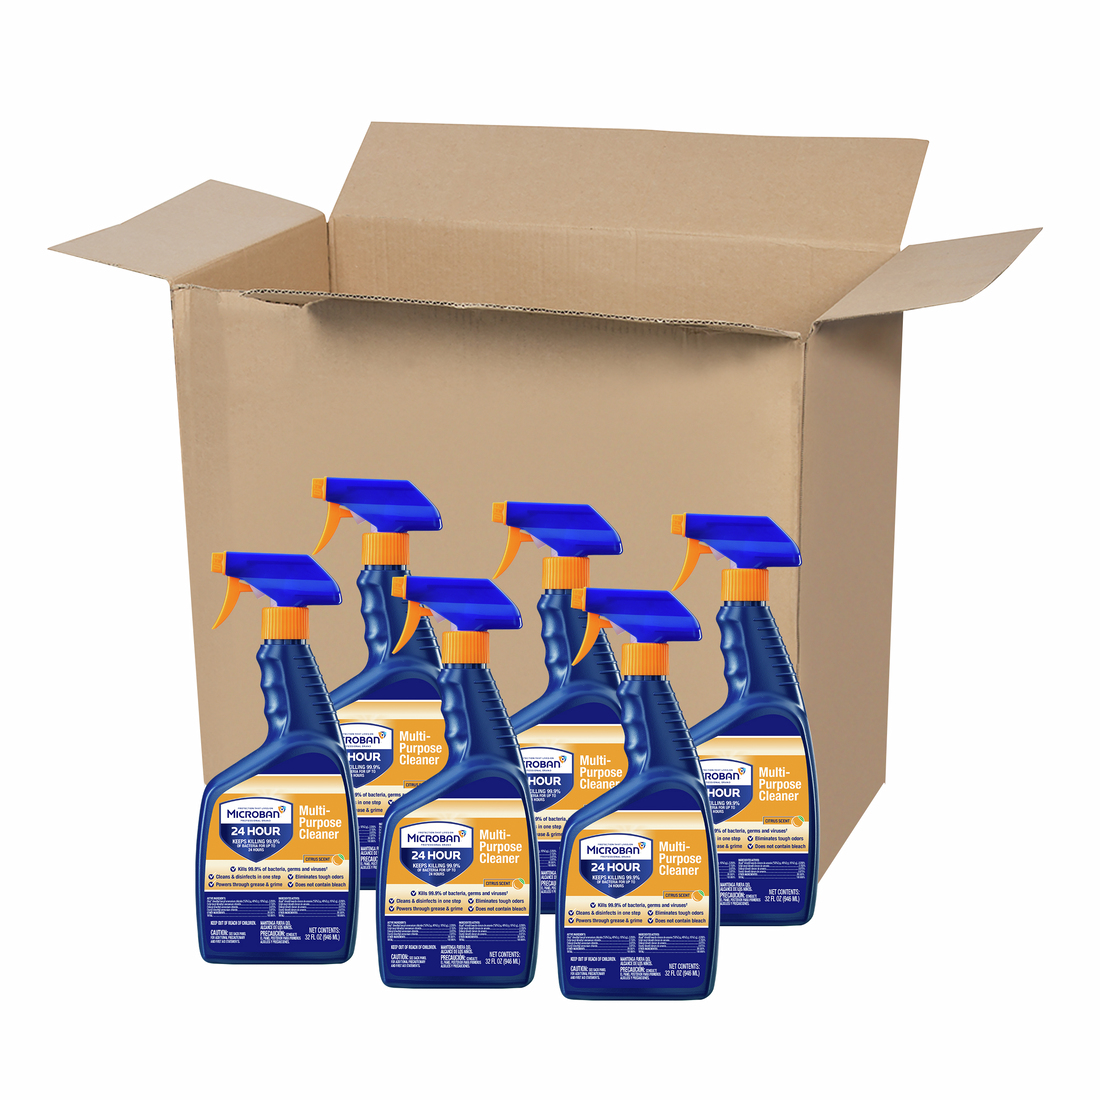 Microban Professional Multi-Purpose Cleaner